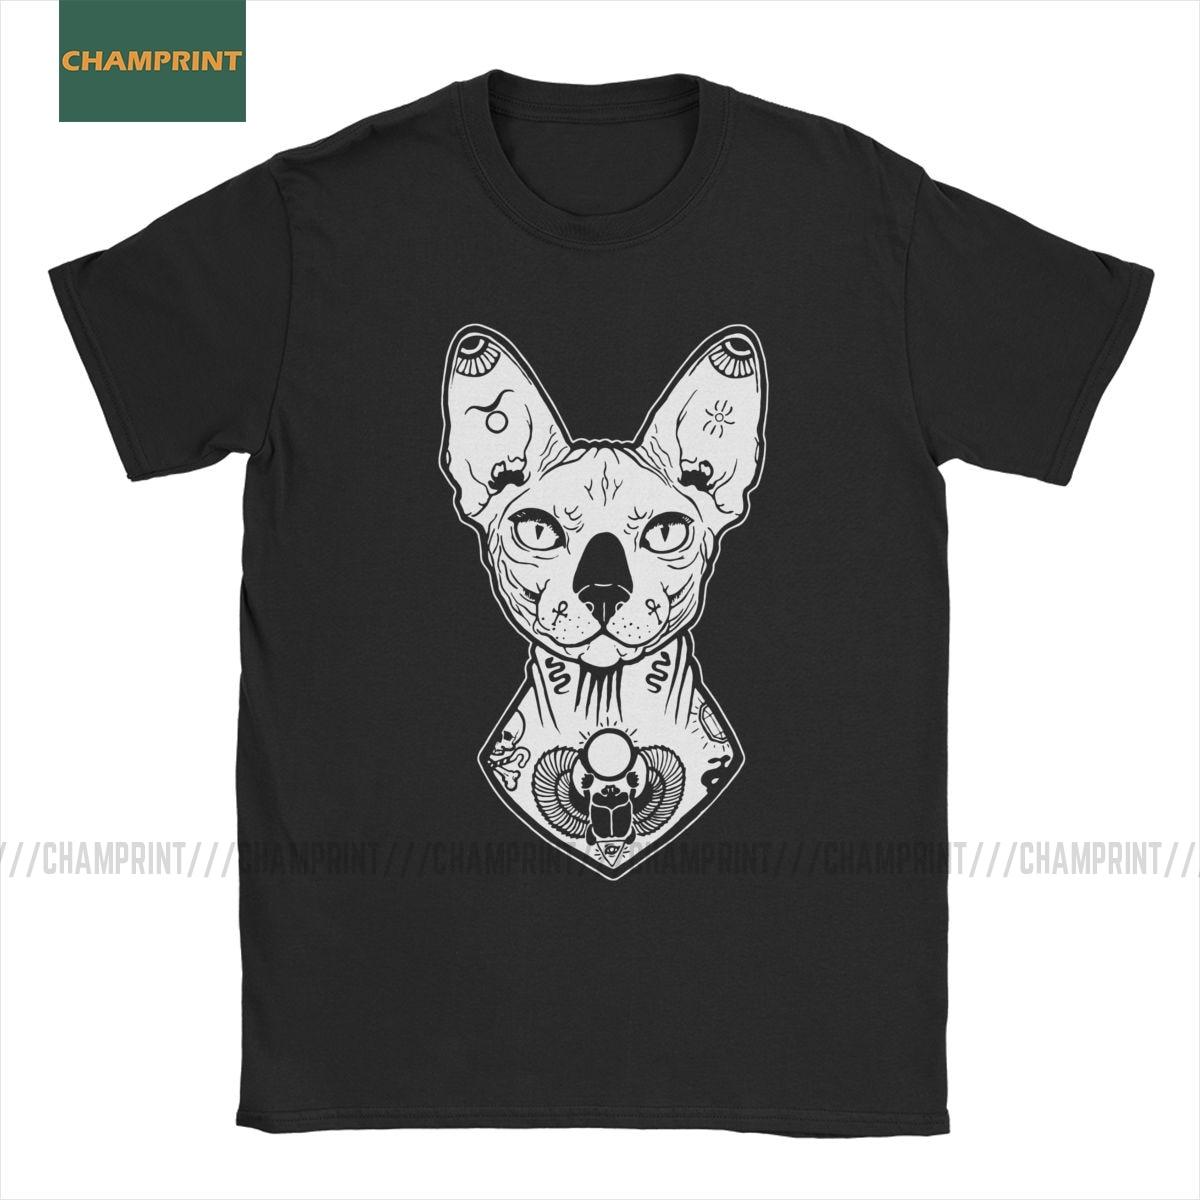 Sphynx, camisetas tatuadas para hombre, 100% de algodón, camiseta Vintage, Gato Canadiense sin pelo, Animal mascota, Linda Camiseta de manga corta, Tops de talla grande